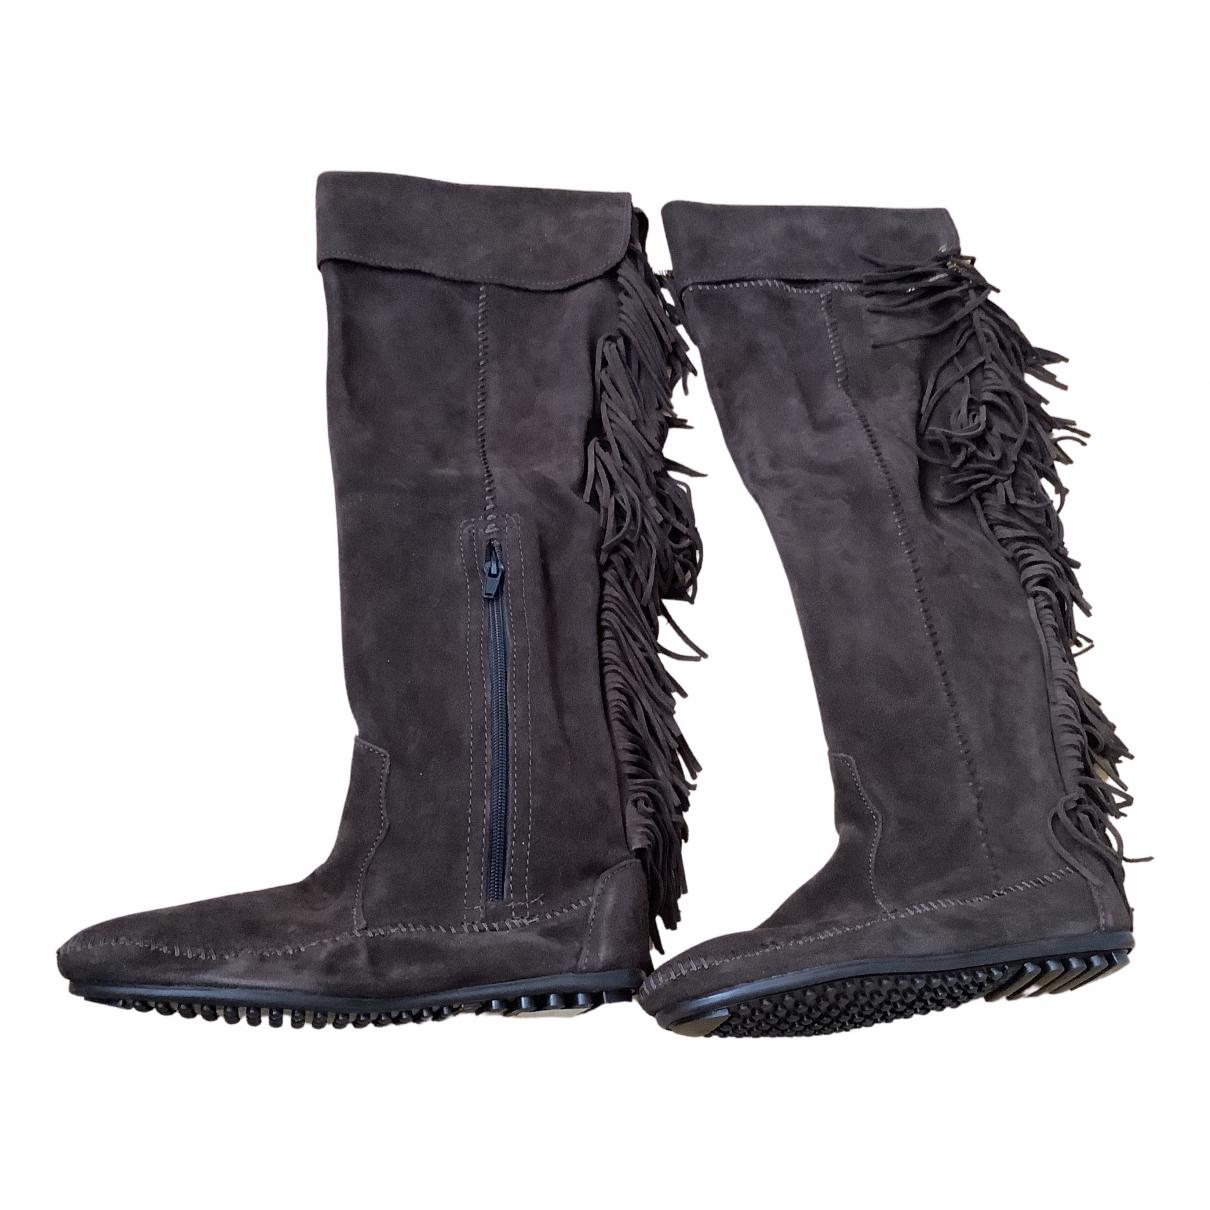 Maje Fall Winter 2019 Brown Suede Boots for Women 38 EU